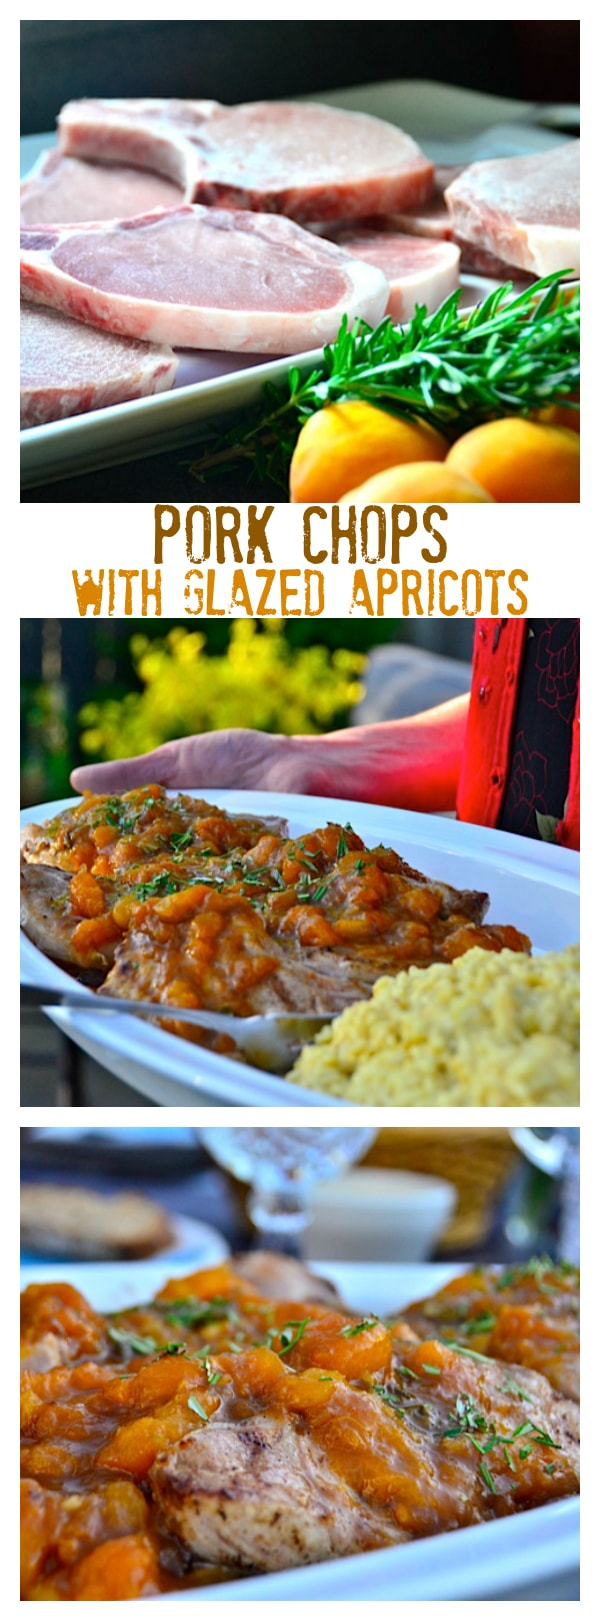 Pork Chops with Glazed Apricots